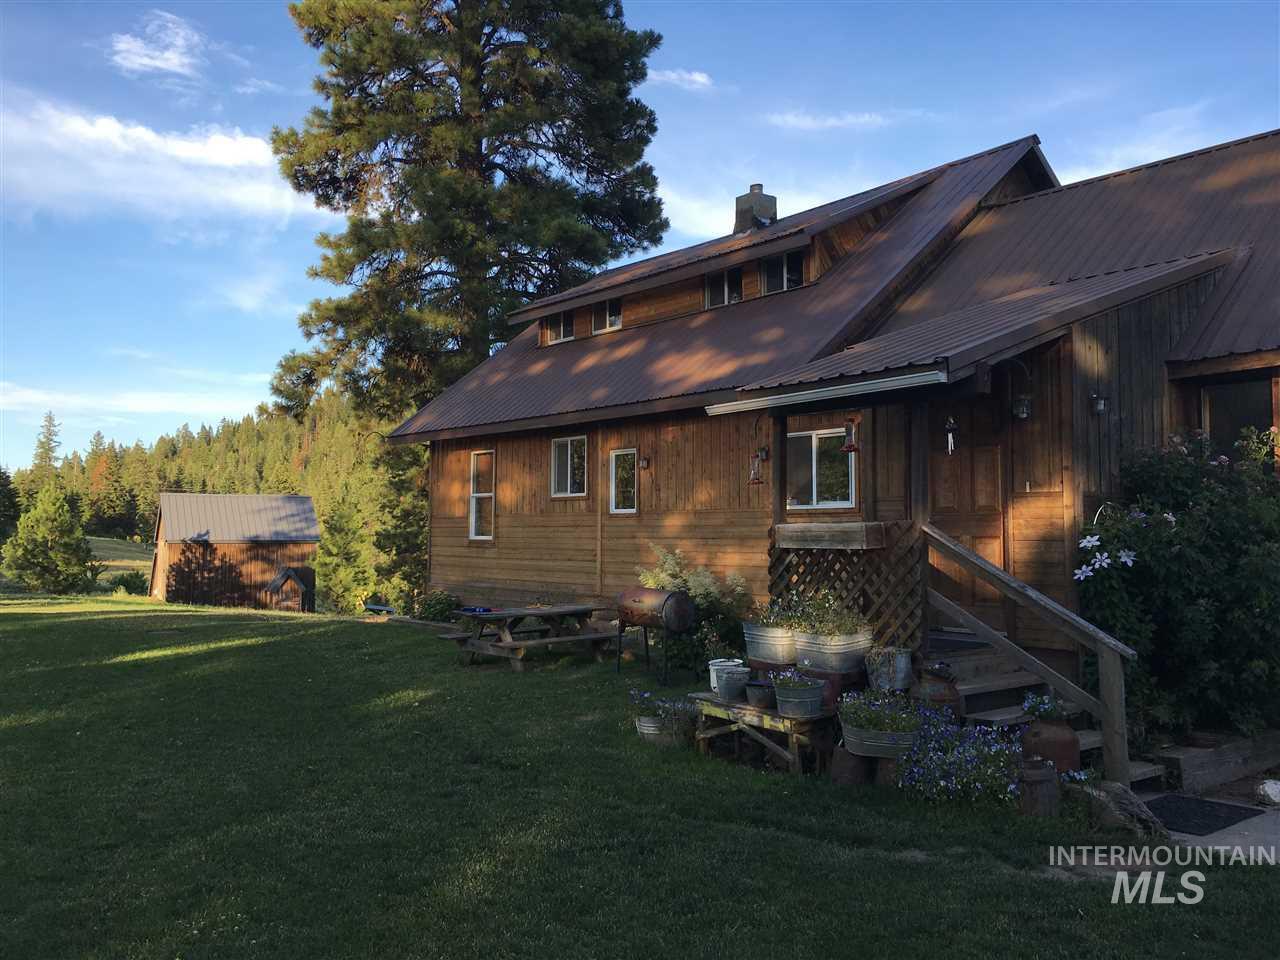 Single Family Home for Sale at 470 Haynes Lane 470 Haynes Lane Plummer, Idaho 83851